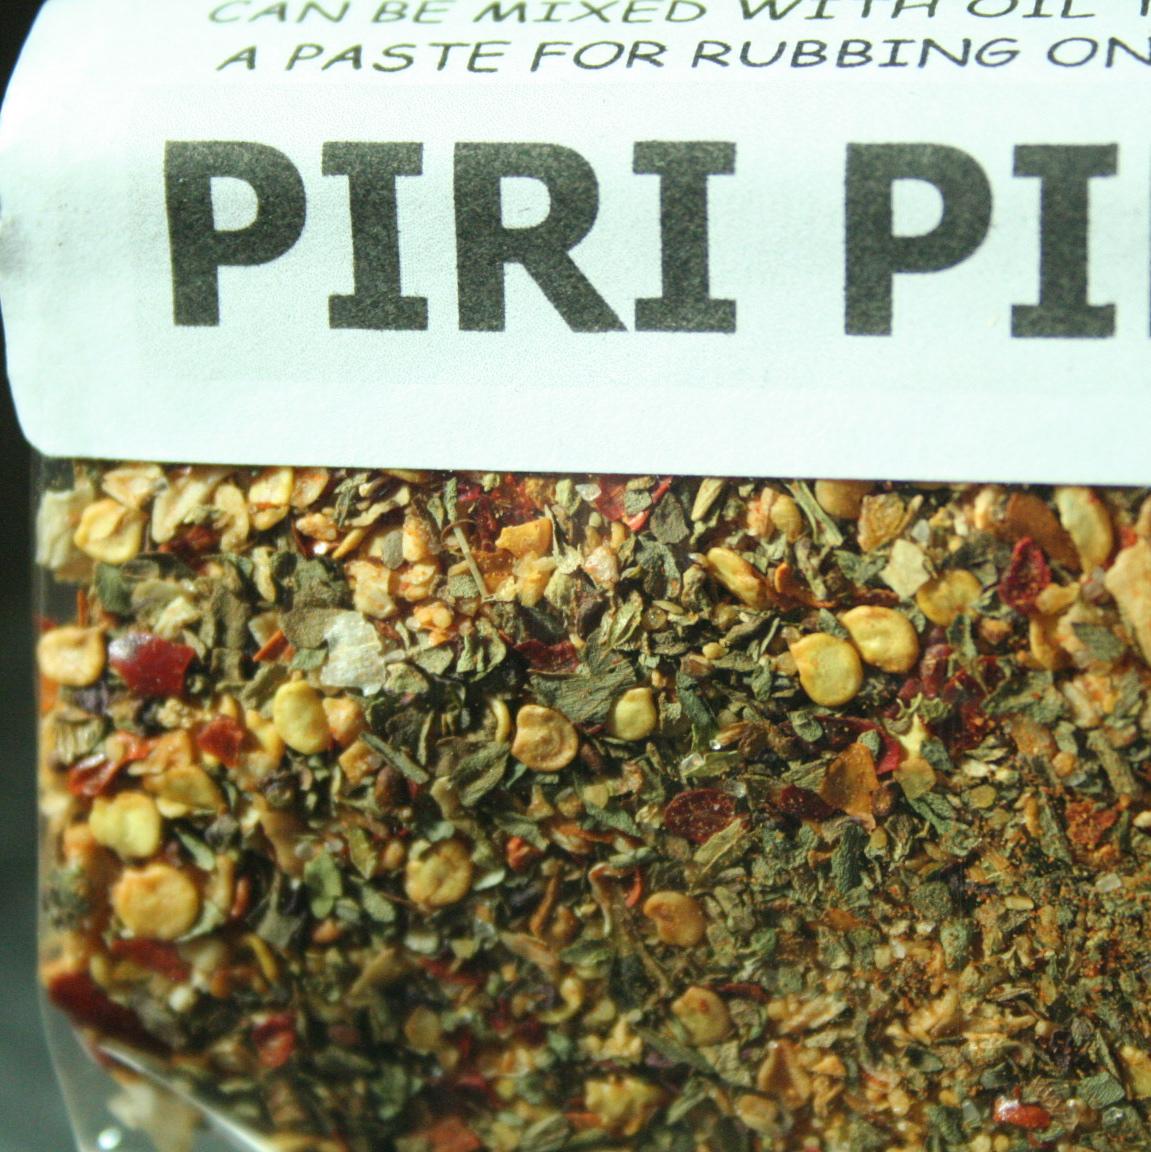 Piri Piri Herb & Spice Blend